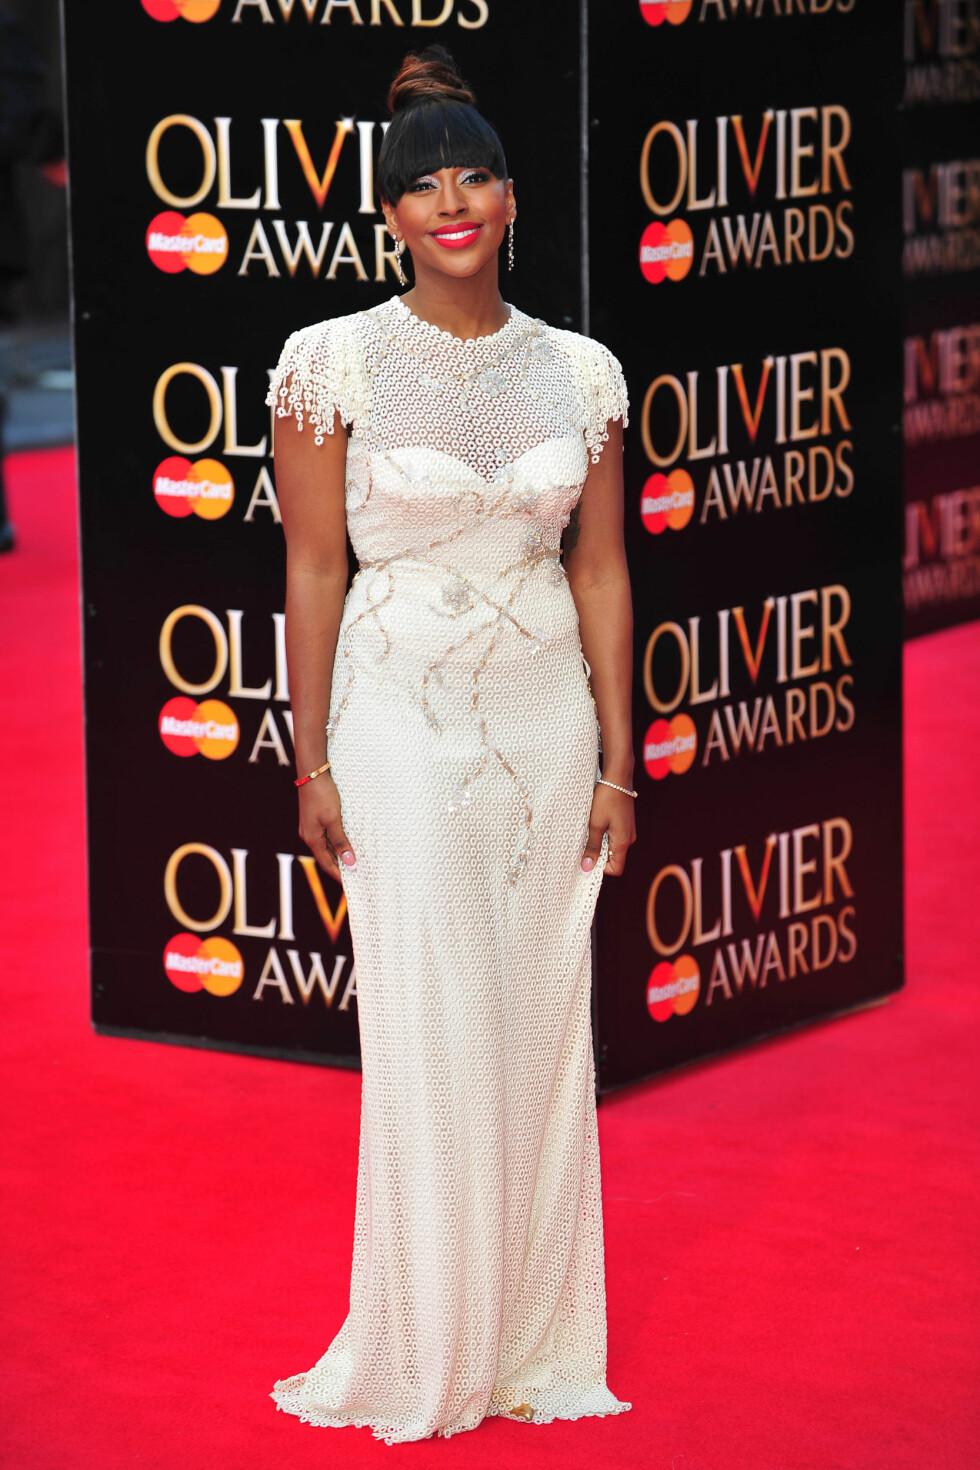 Laurence Olivier Awards: Alexandra Burke Foto: Reimschuessel / Splash News/ All Over Press